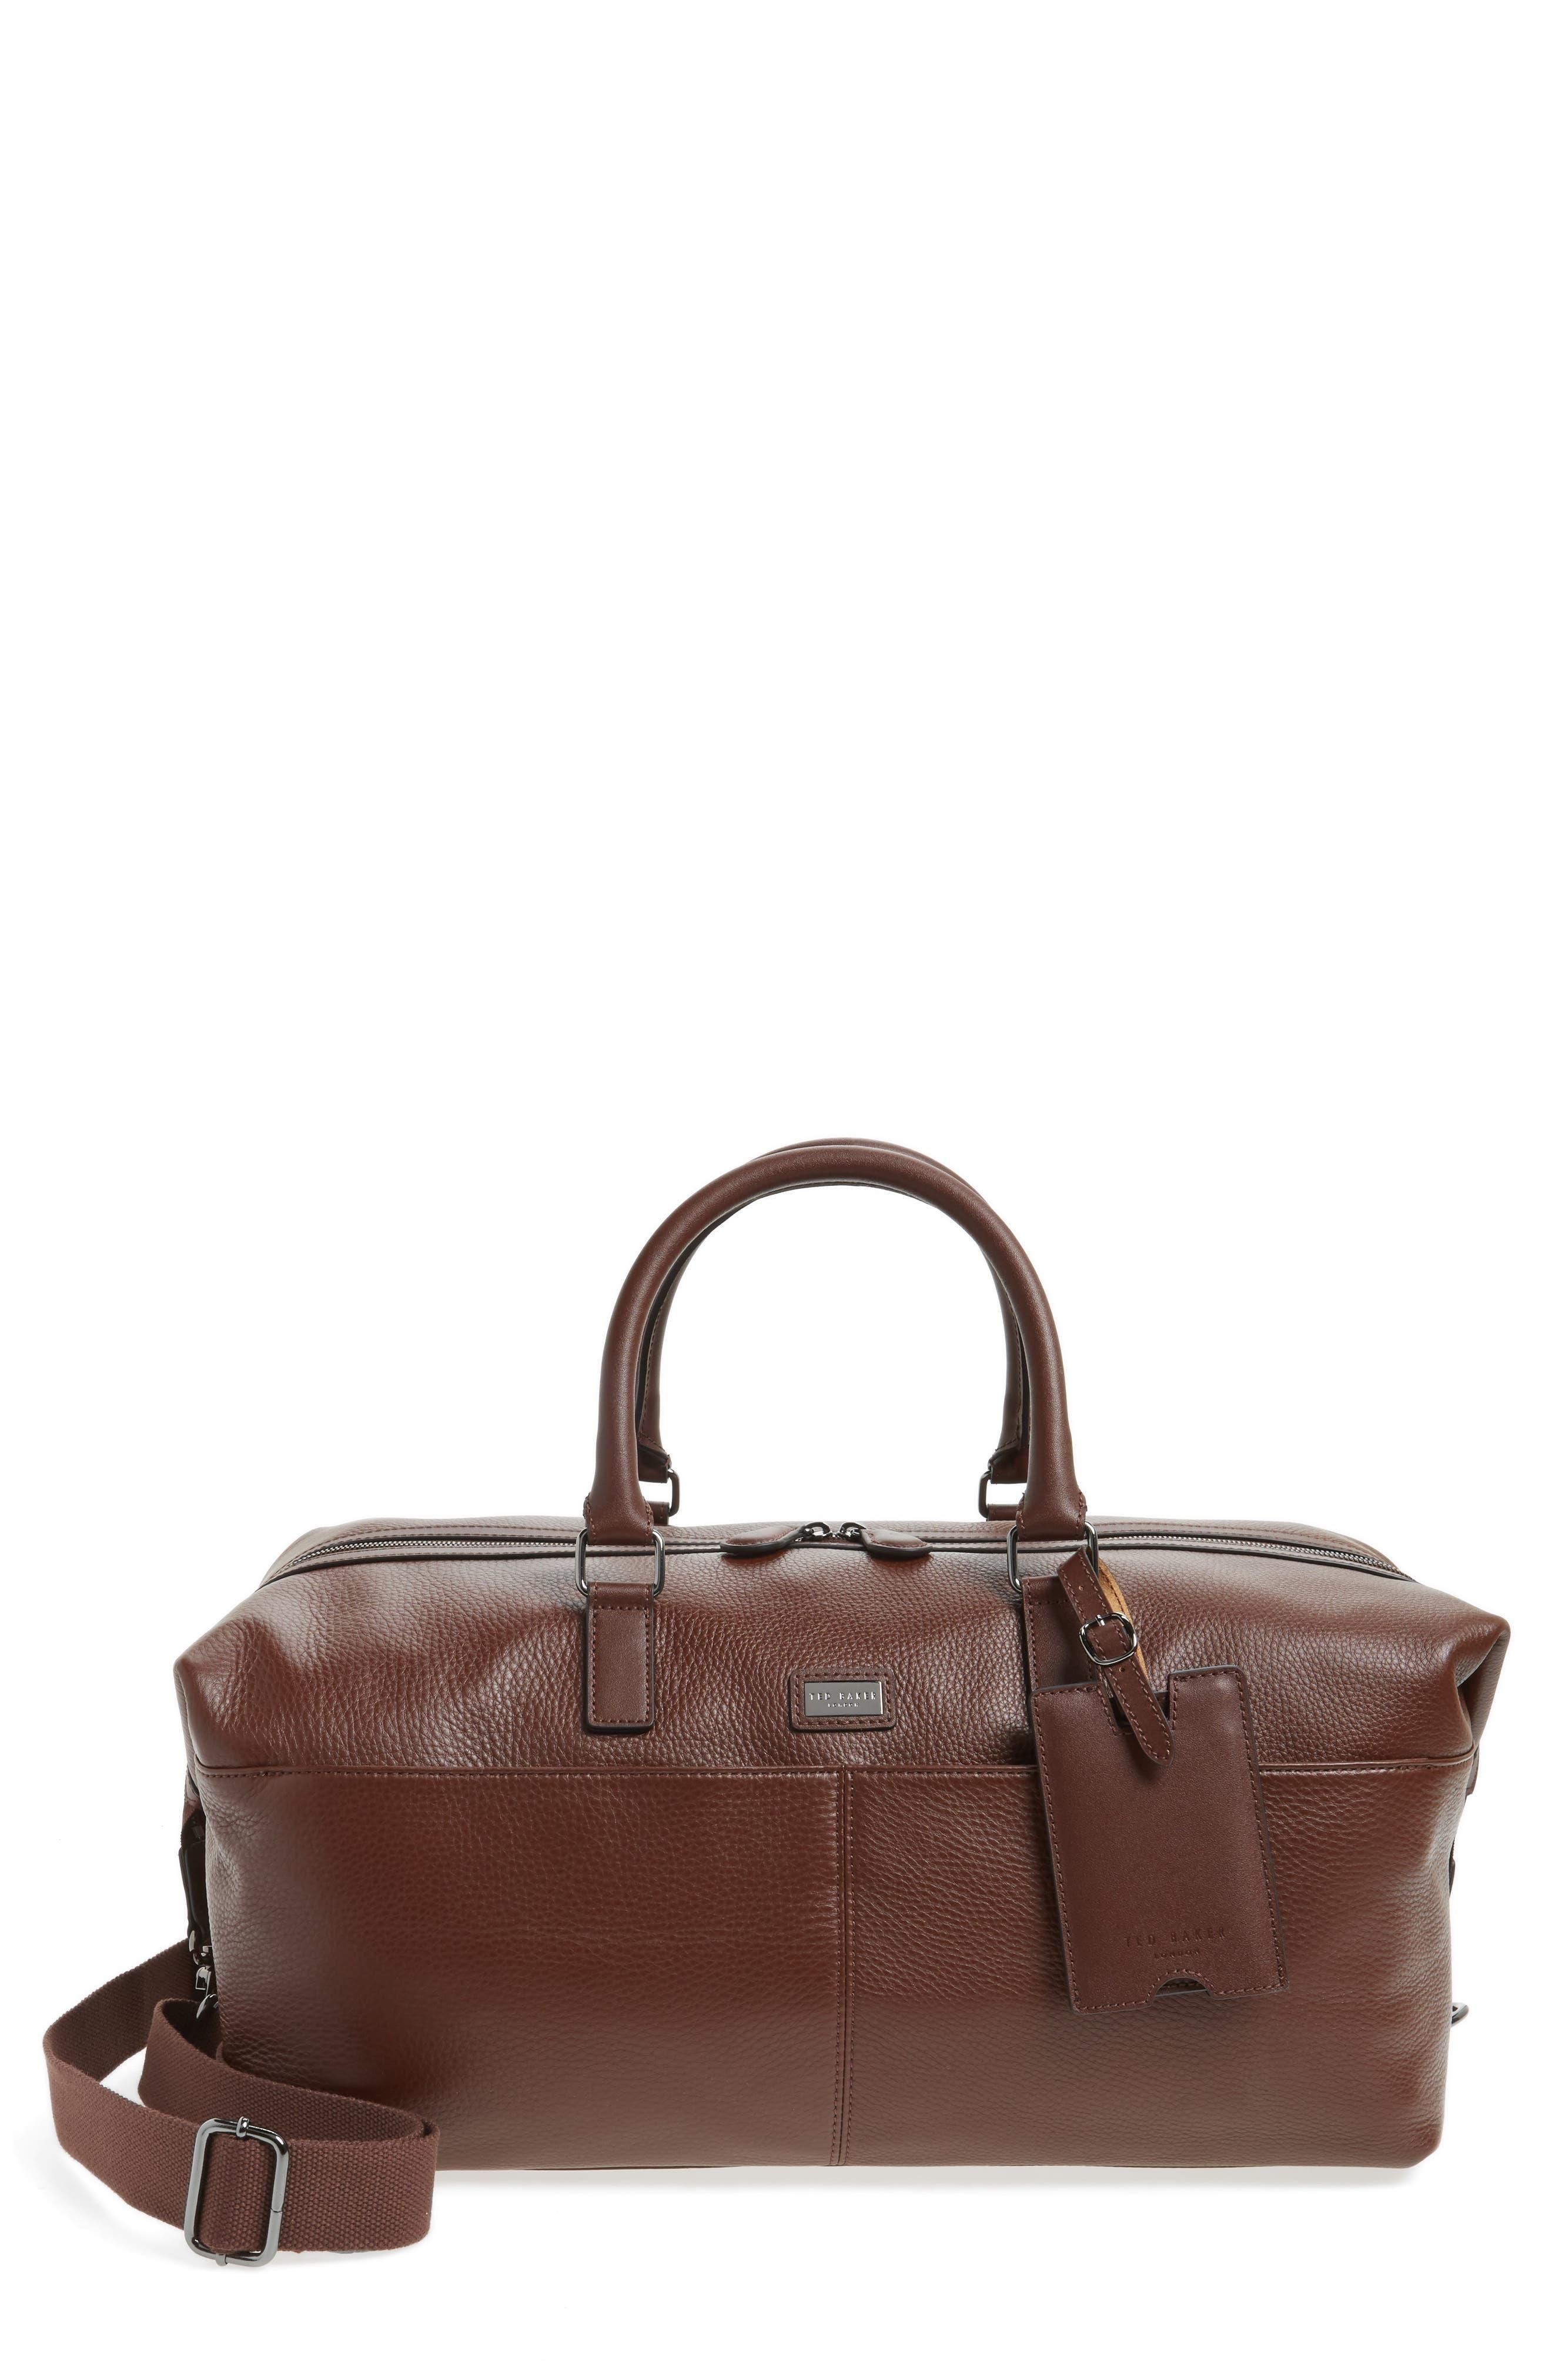 Leather Duffel Bag,                             Main thumbnail 1, color,                             217